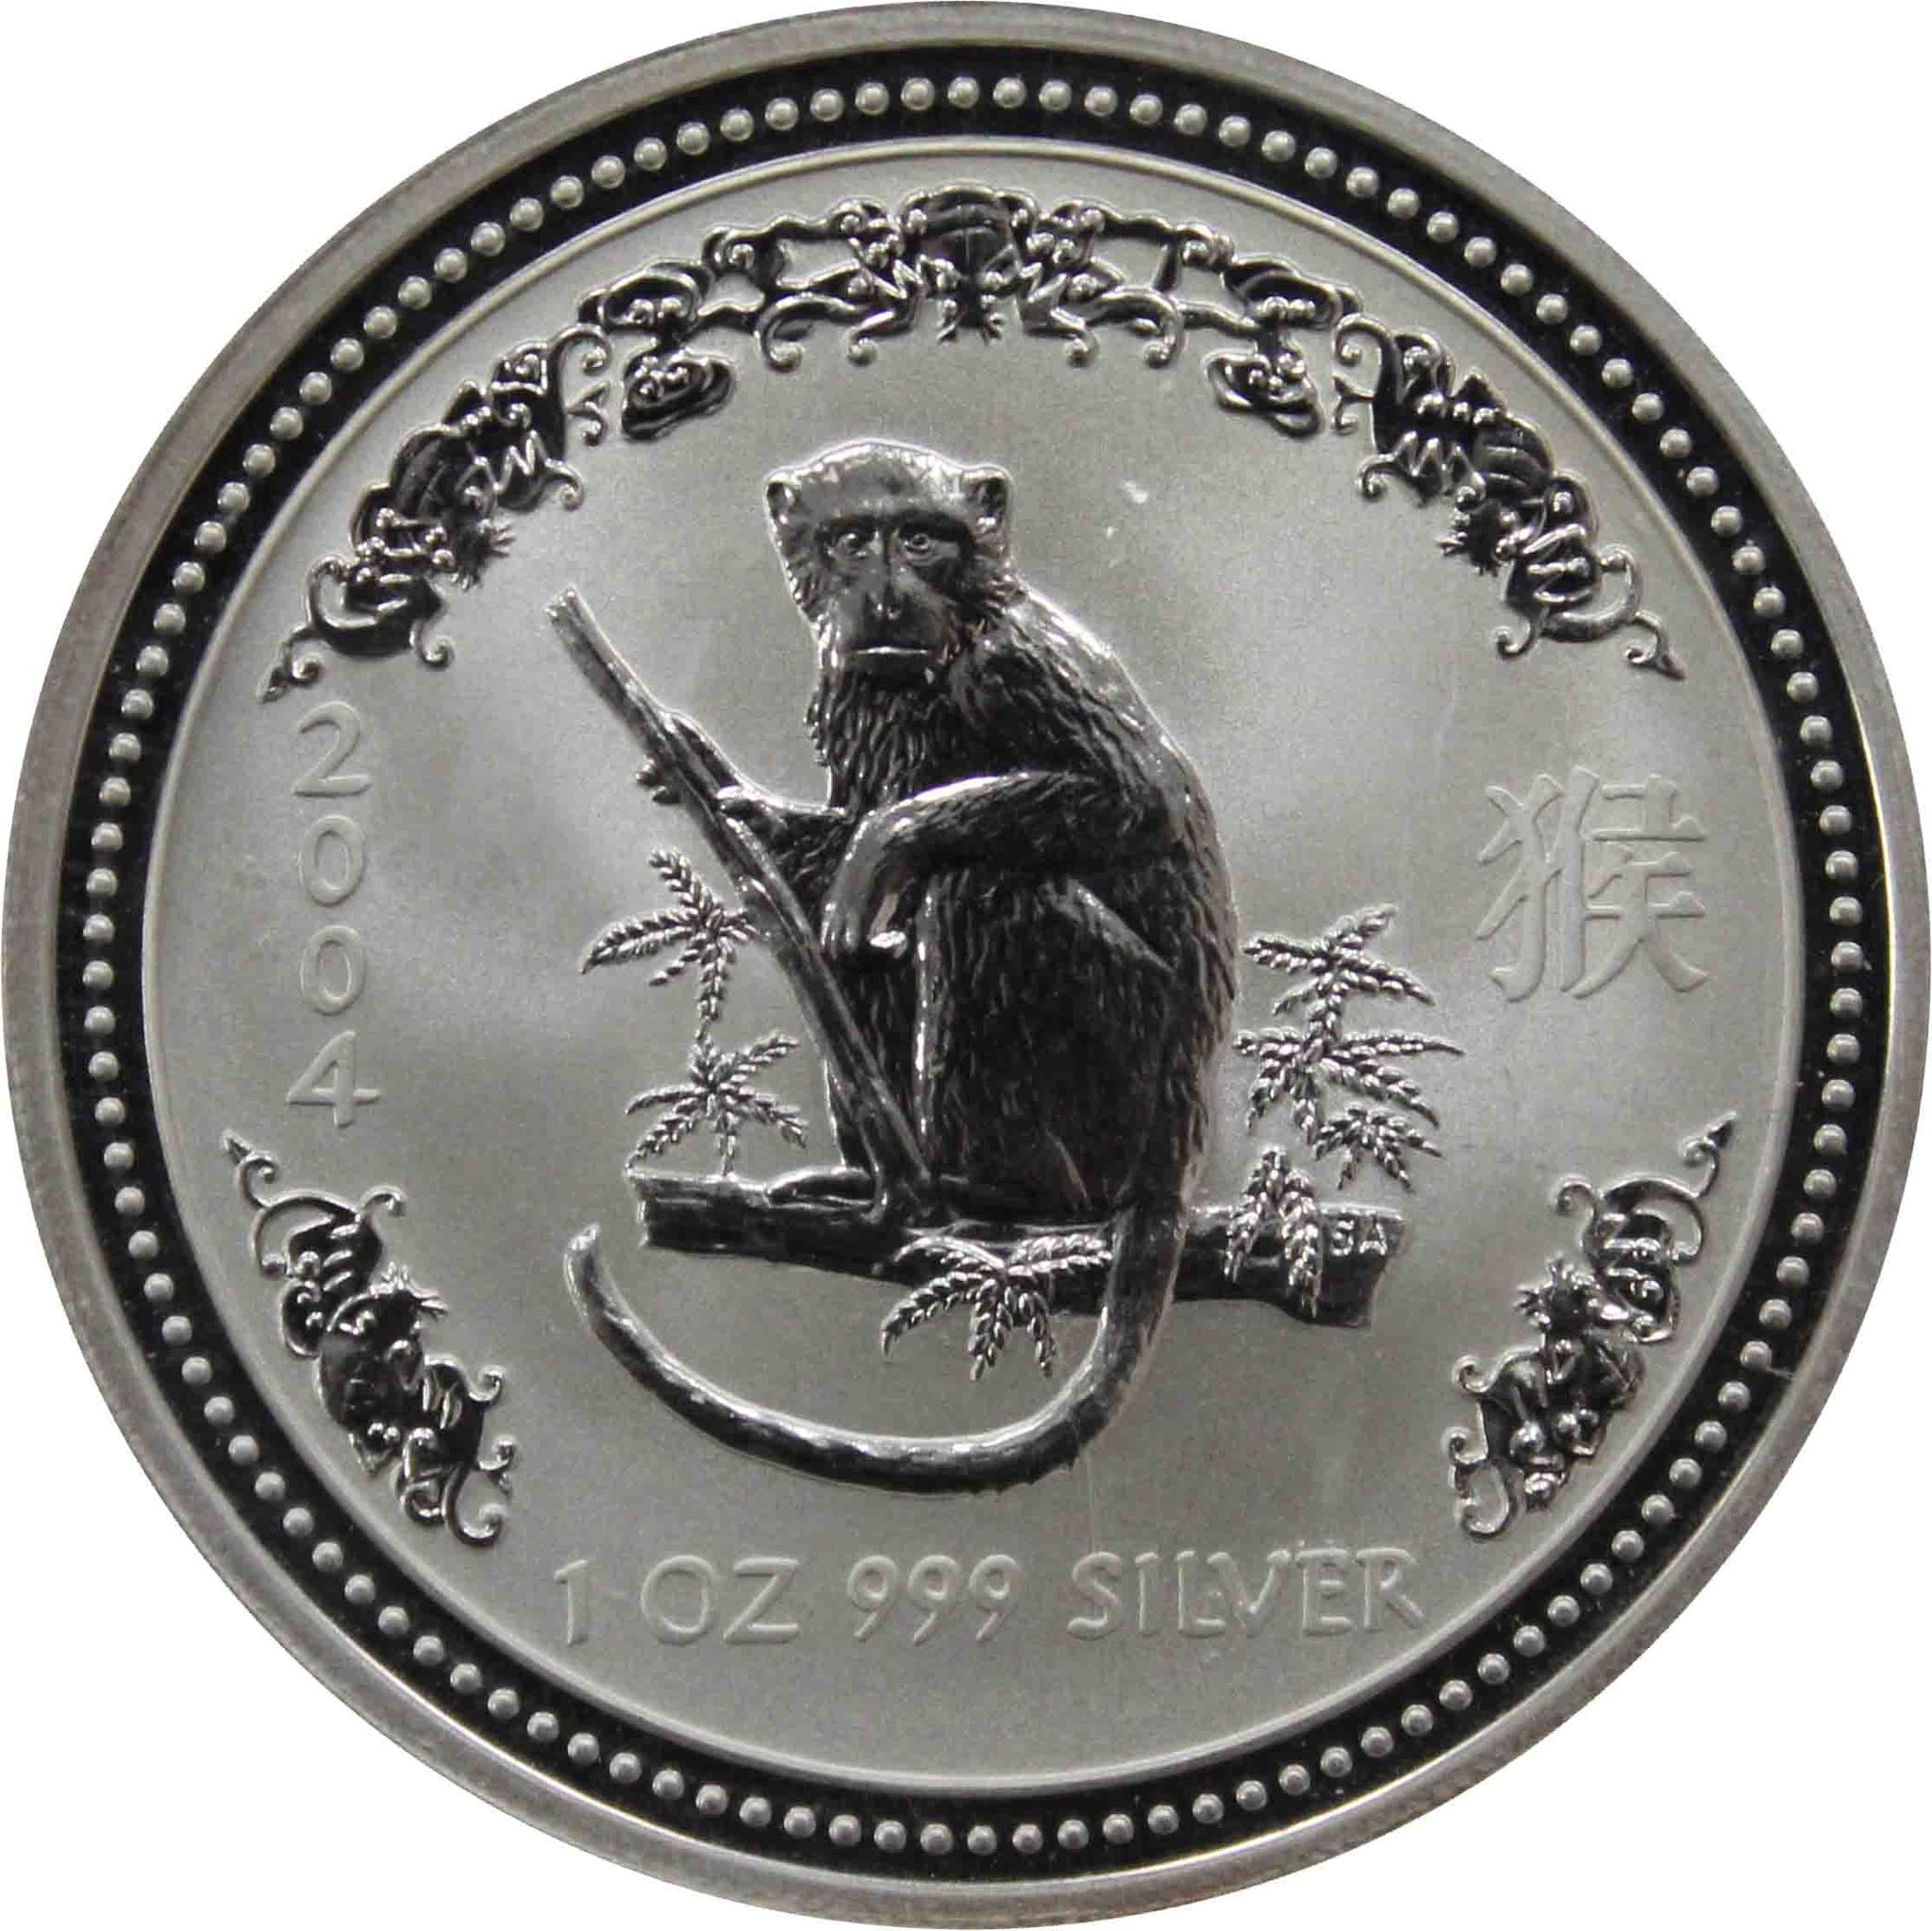 1 доллар. Год Обезьяны. Австралия. 2004 год